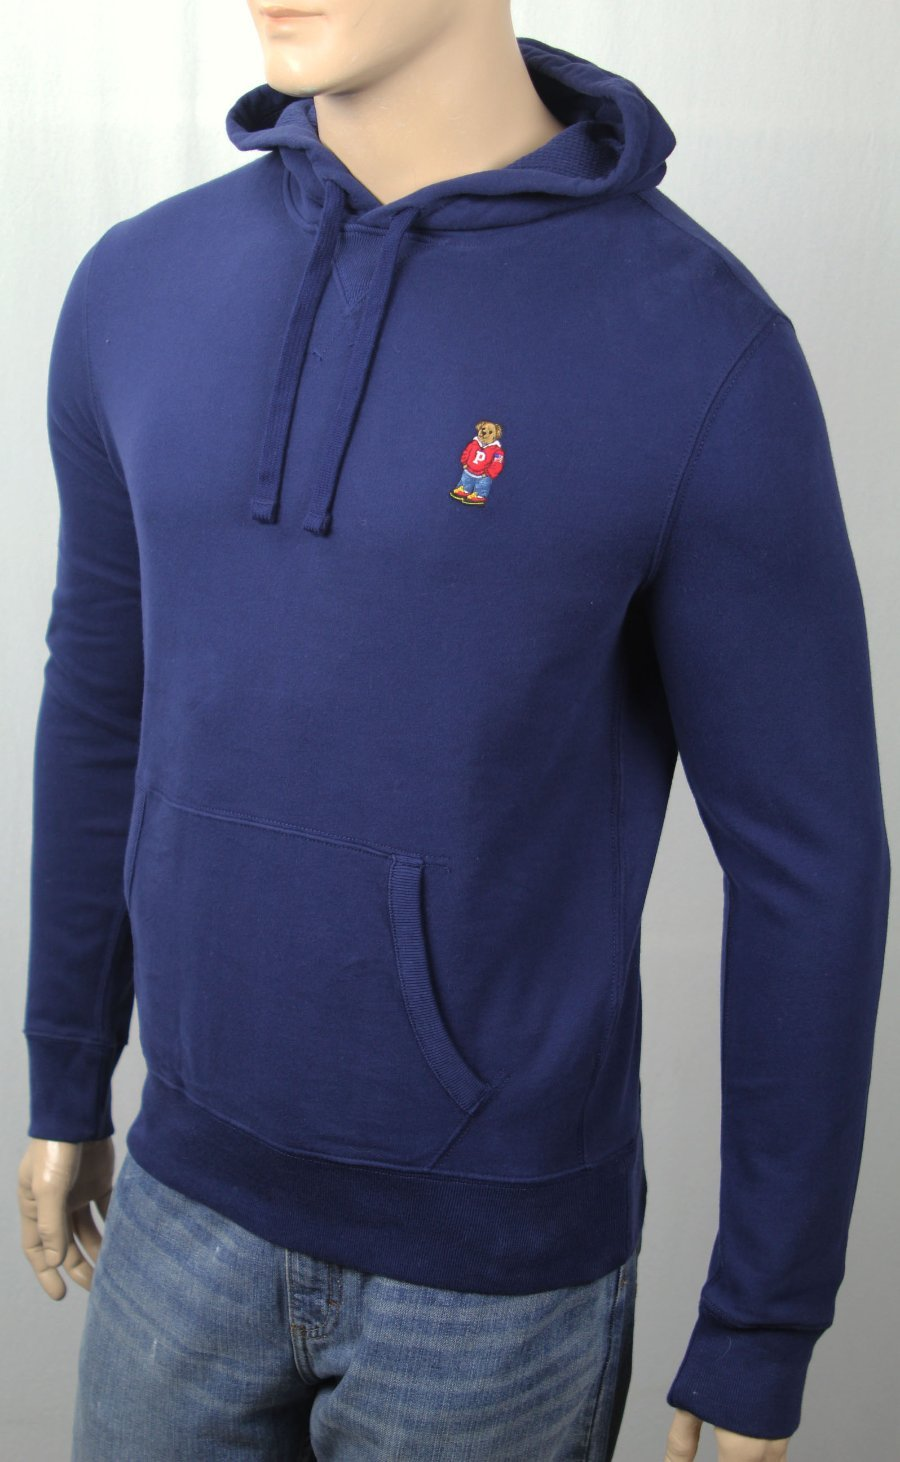 Polo Ralph Lauren Sweatshirt Dress Navy Blue